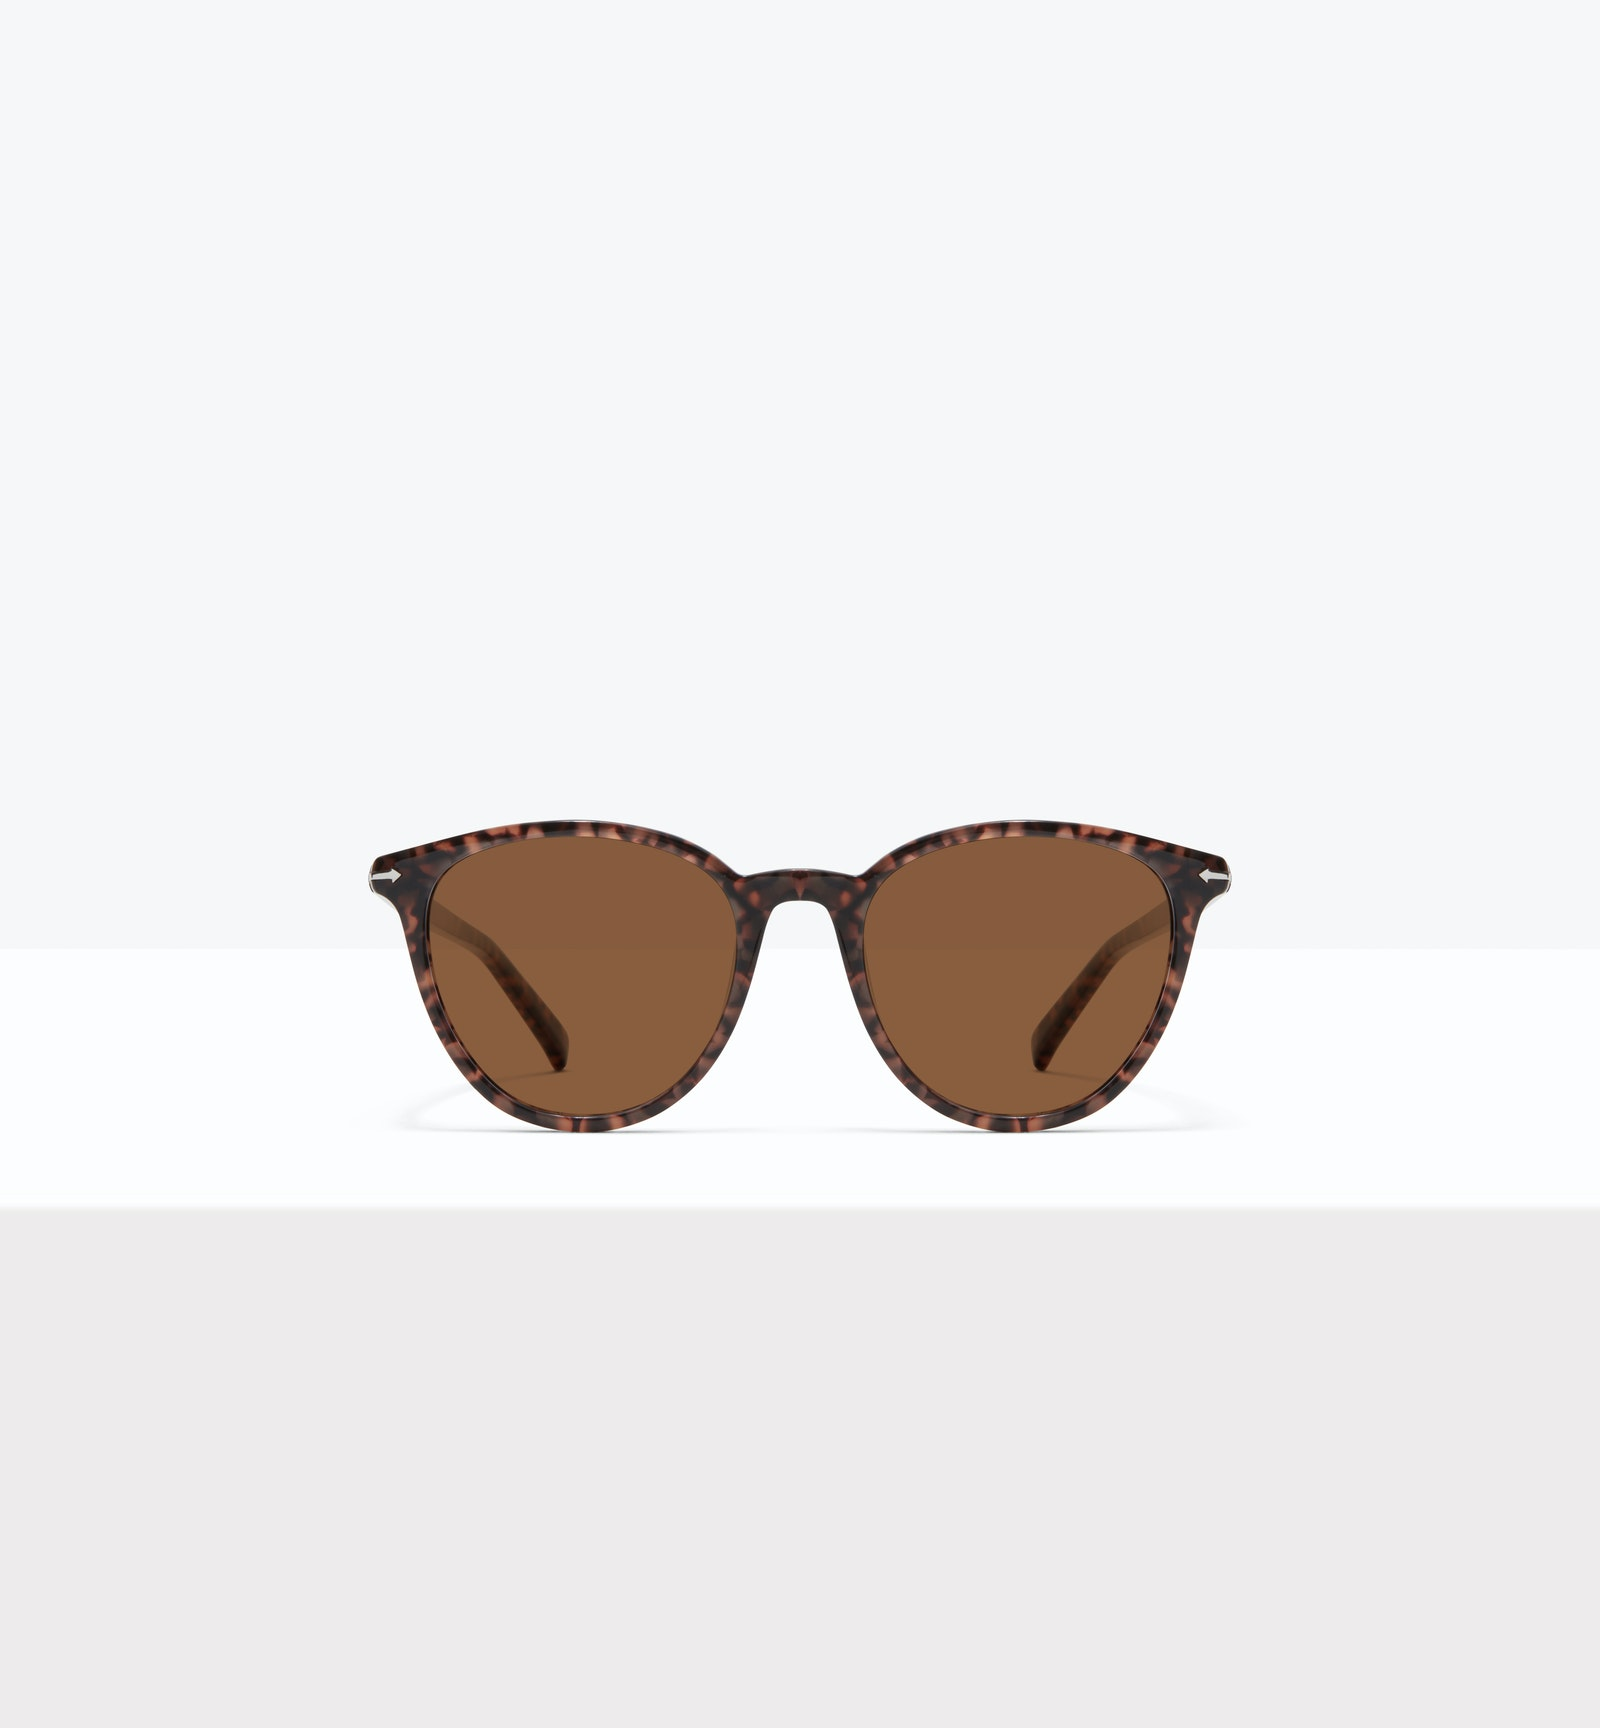 Affordable Fashion Glasses Round Sunglasses Women London Leo